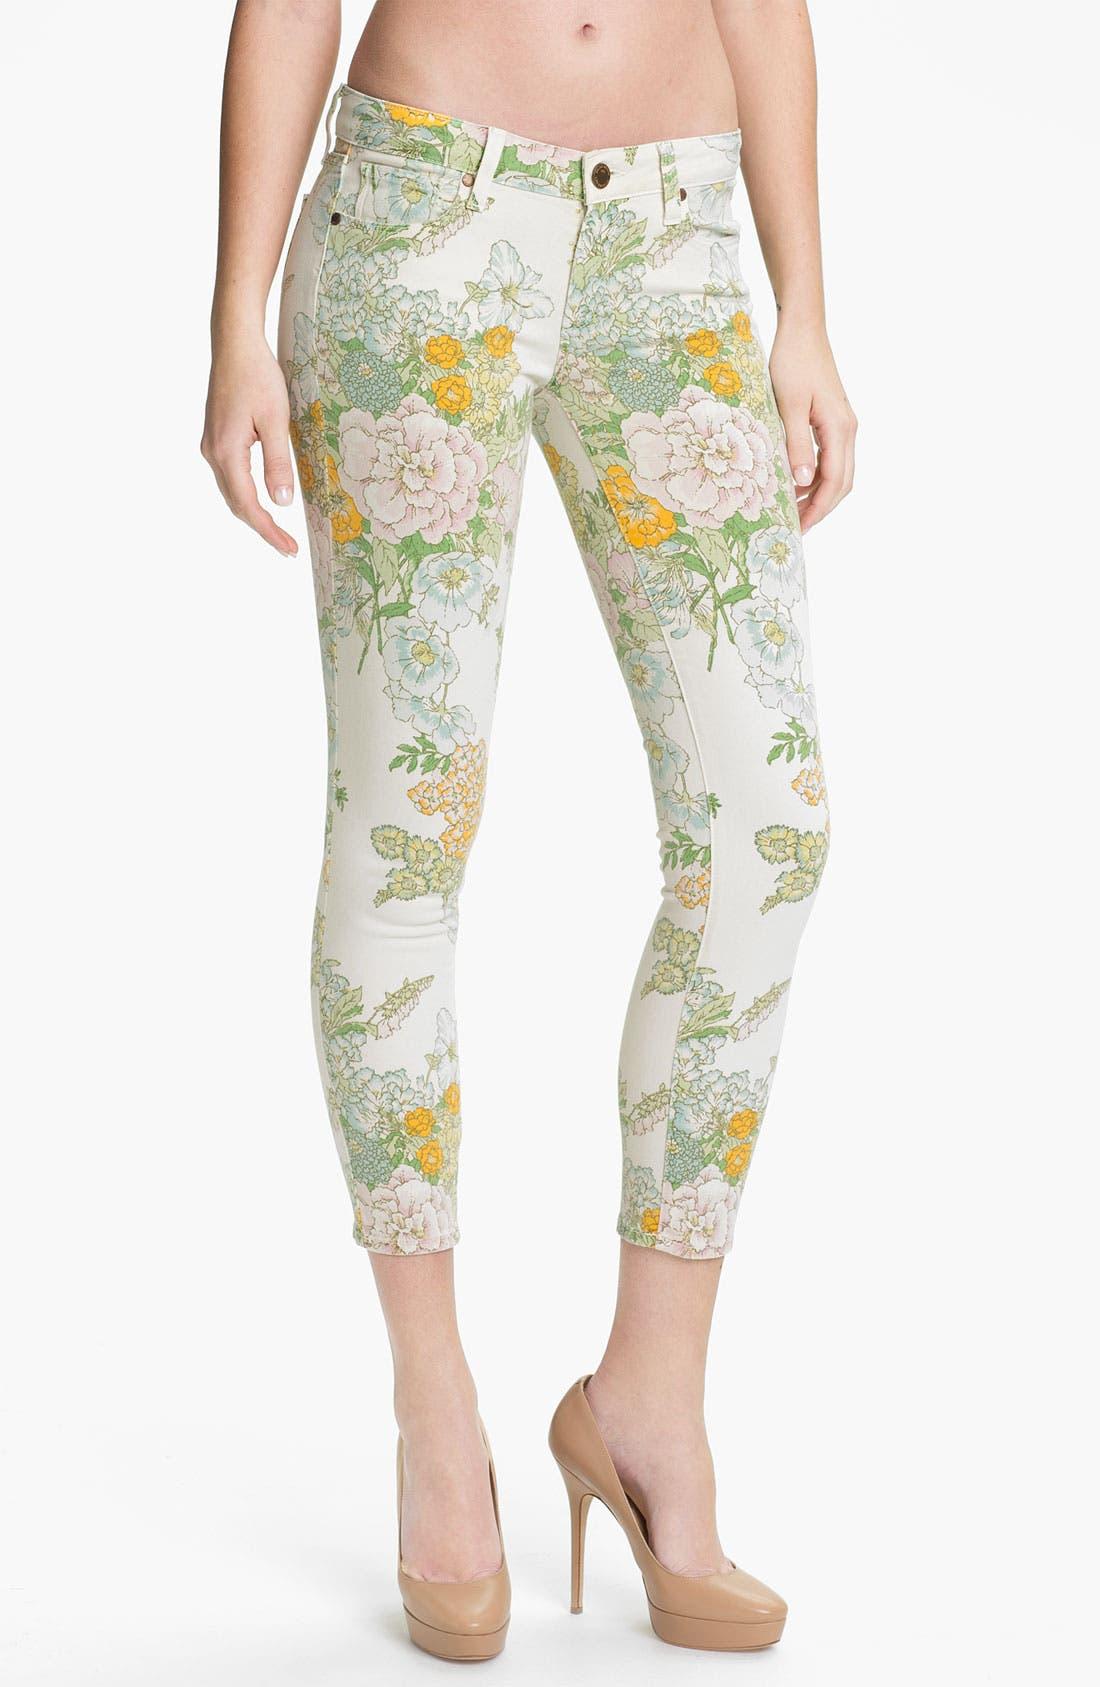 Alternate Image 1 Selected - Paige Denim 'Verdugo' Print Skinny Jeans (Flea Market Floral)